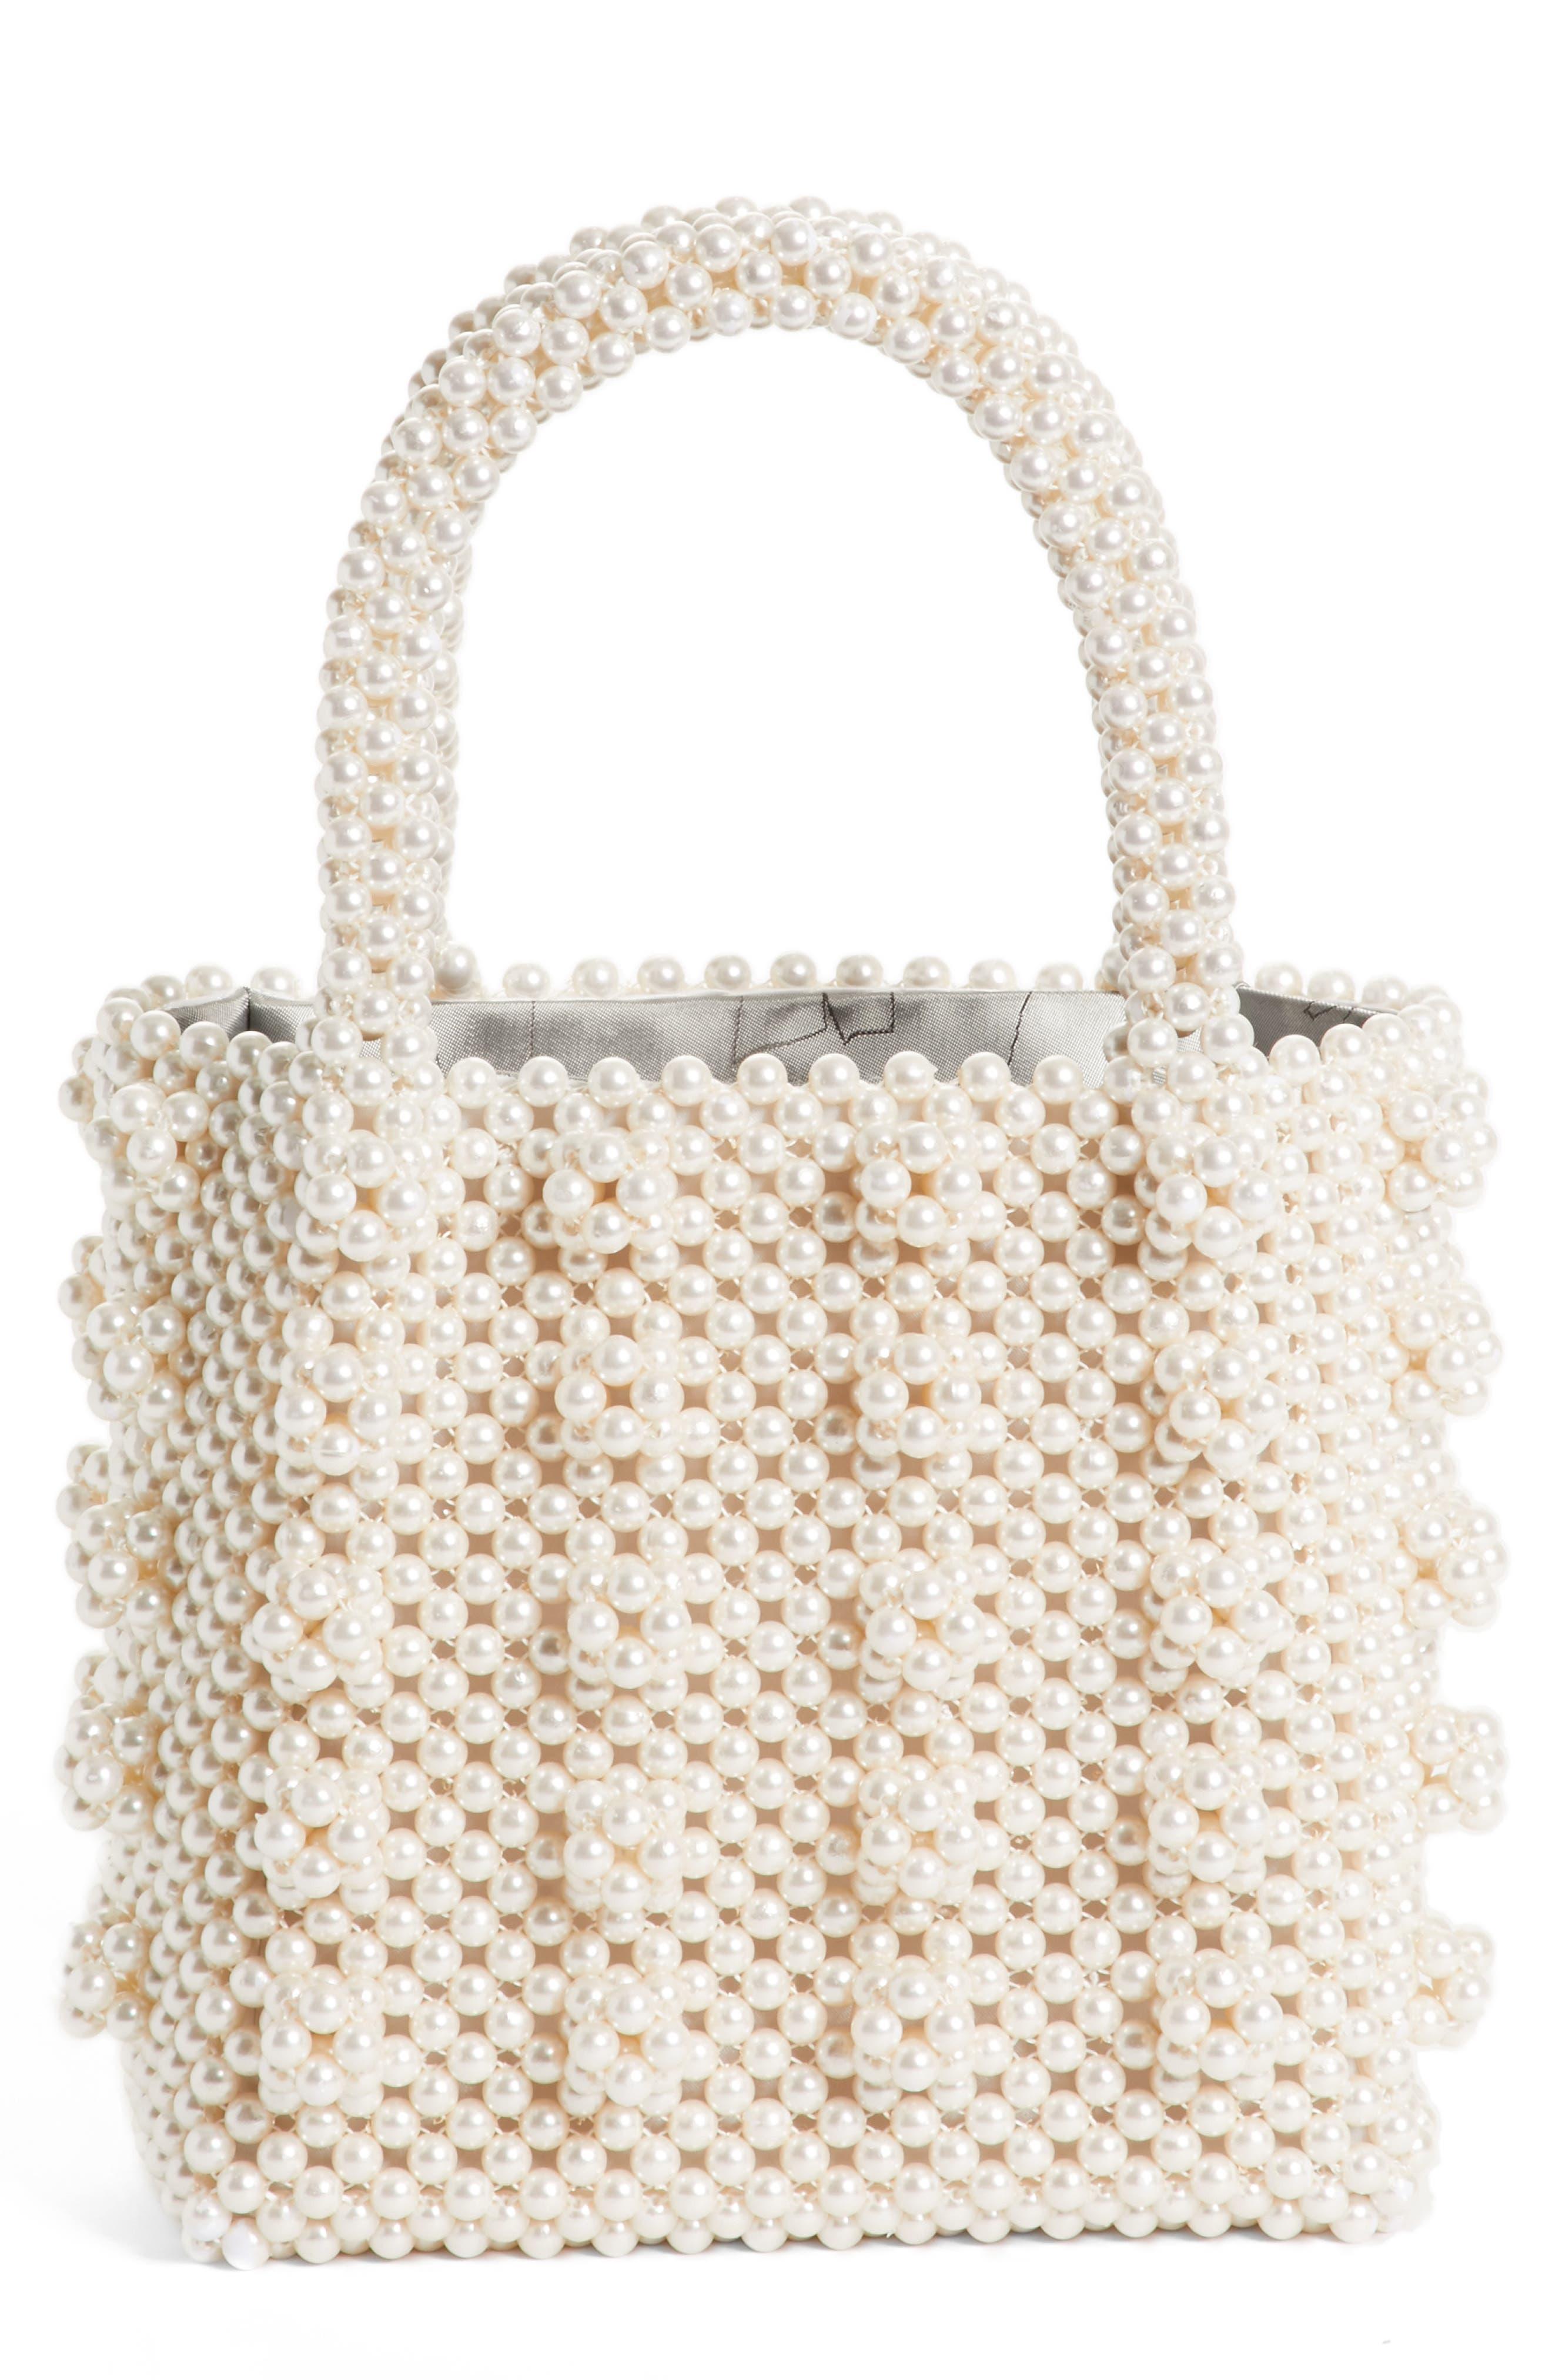 Antonia Small Imitation Pearl Beaded Handbag,                             Main thumbnail 1, color,                             Cream